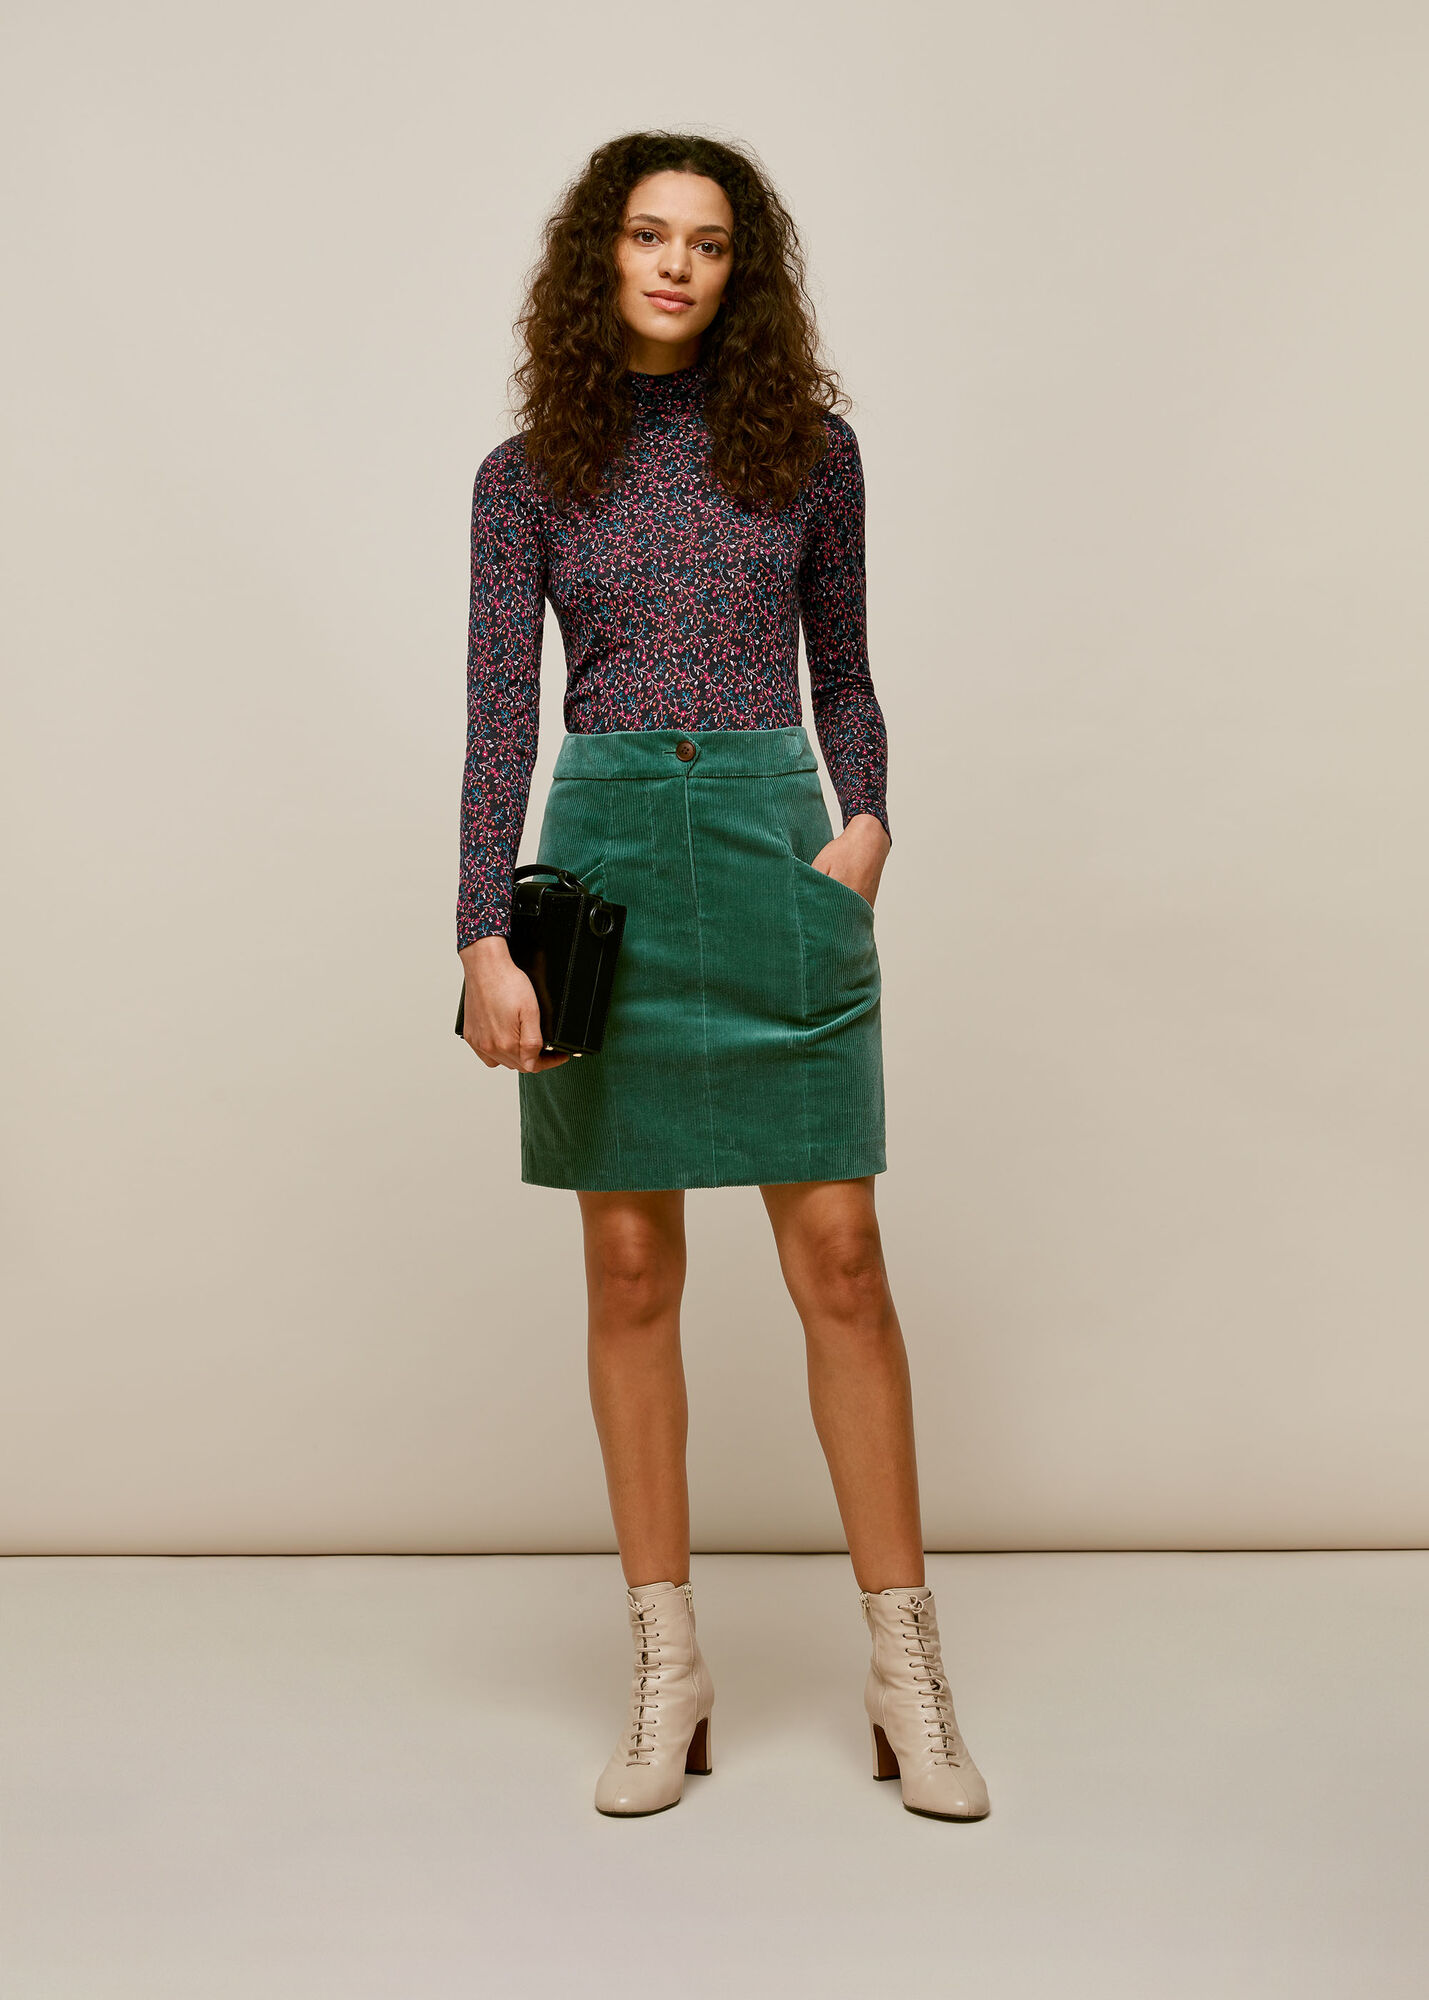 Star Print Floral Wool Mix Top